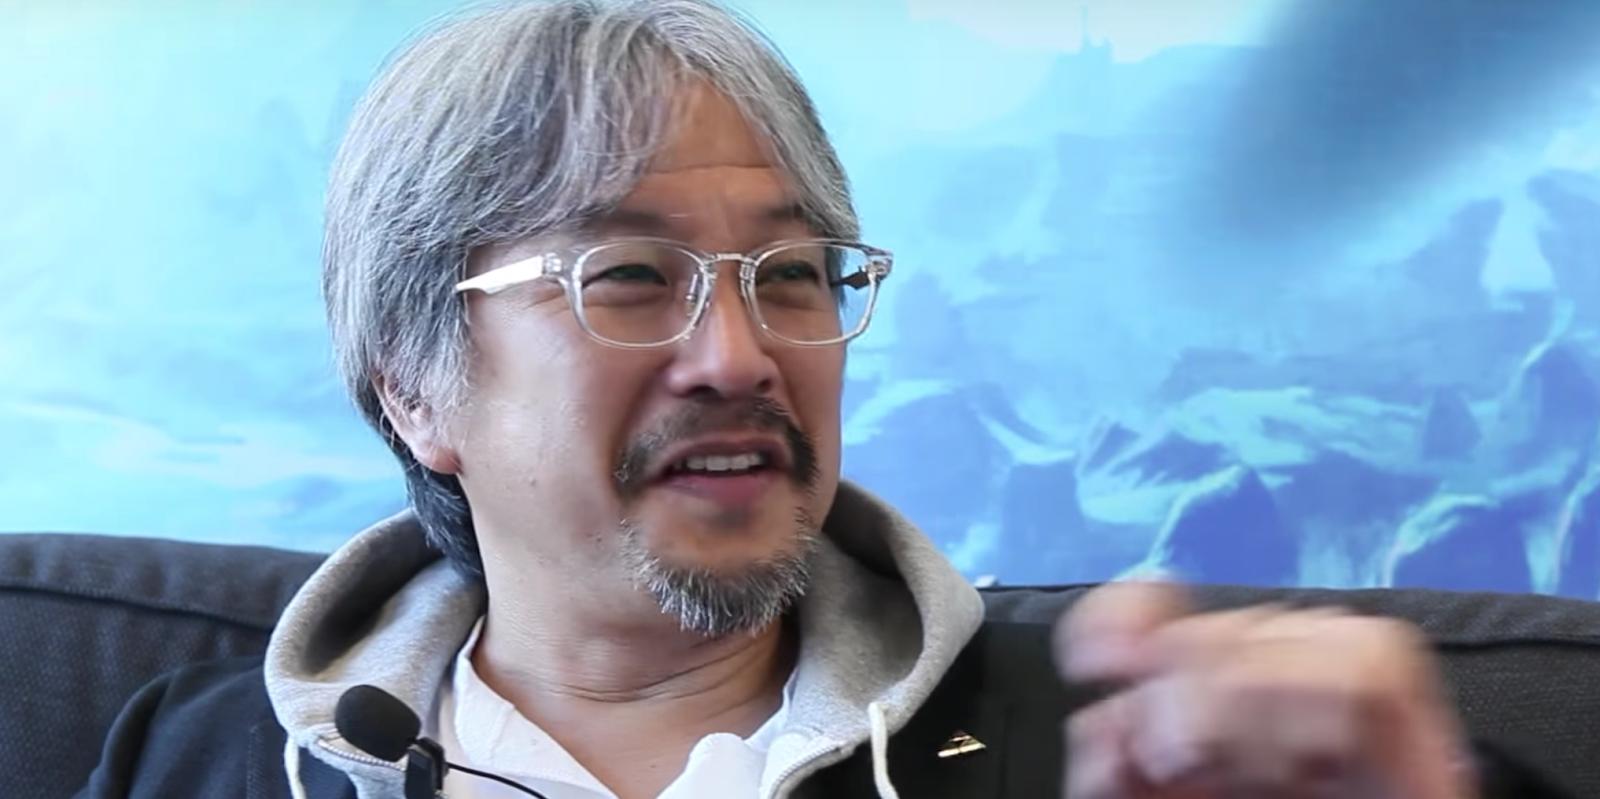 Eiji Aonuma confiesa cuál es su diseño de Link favorito